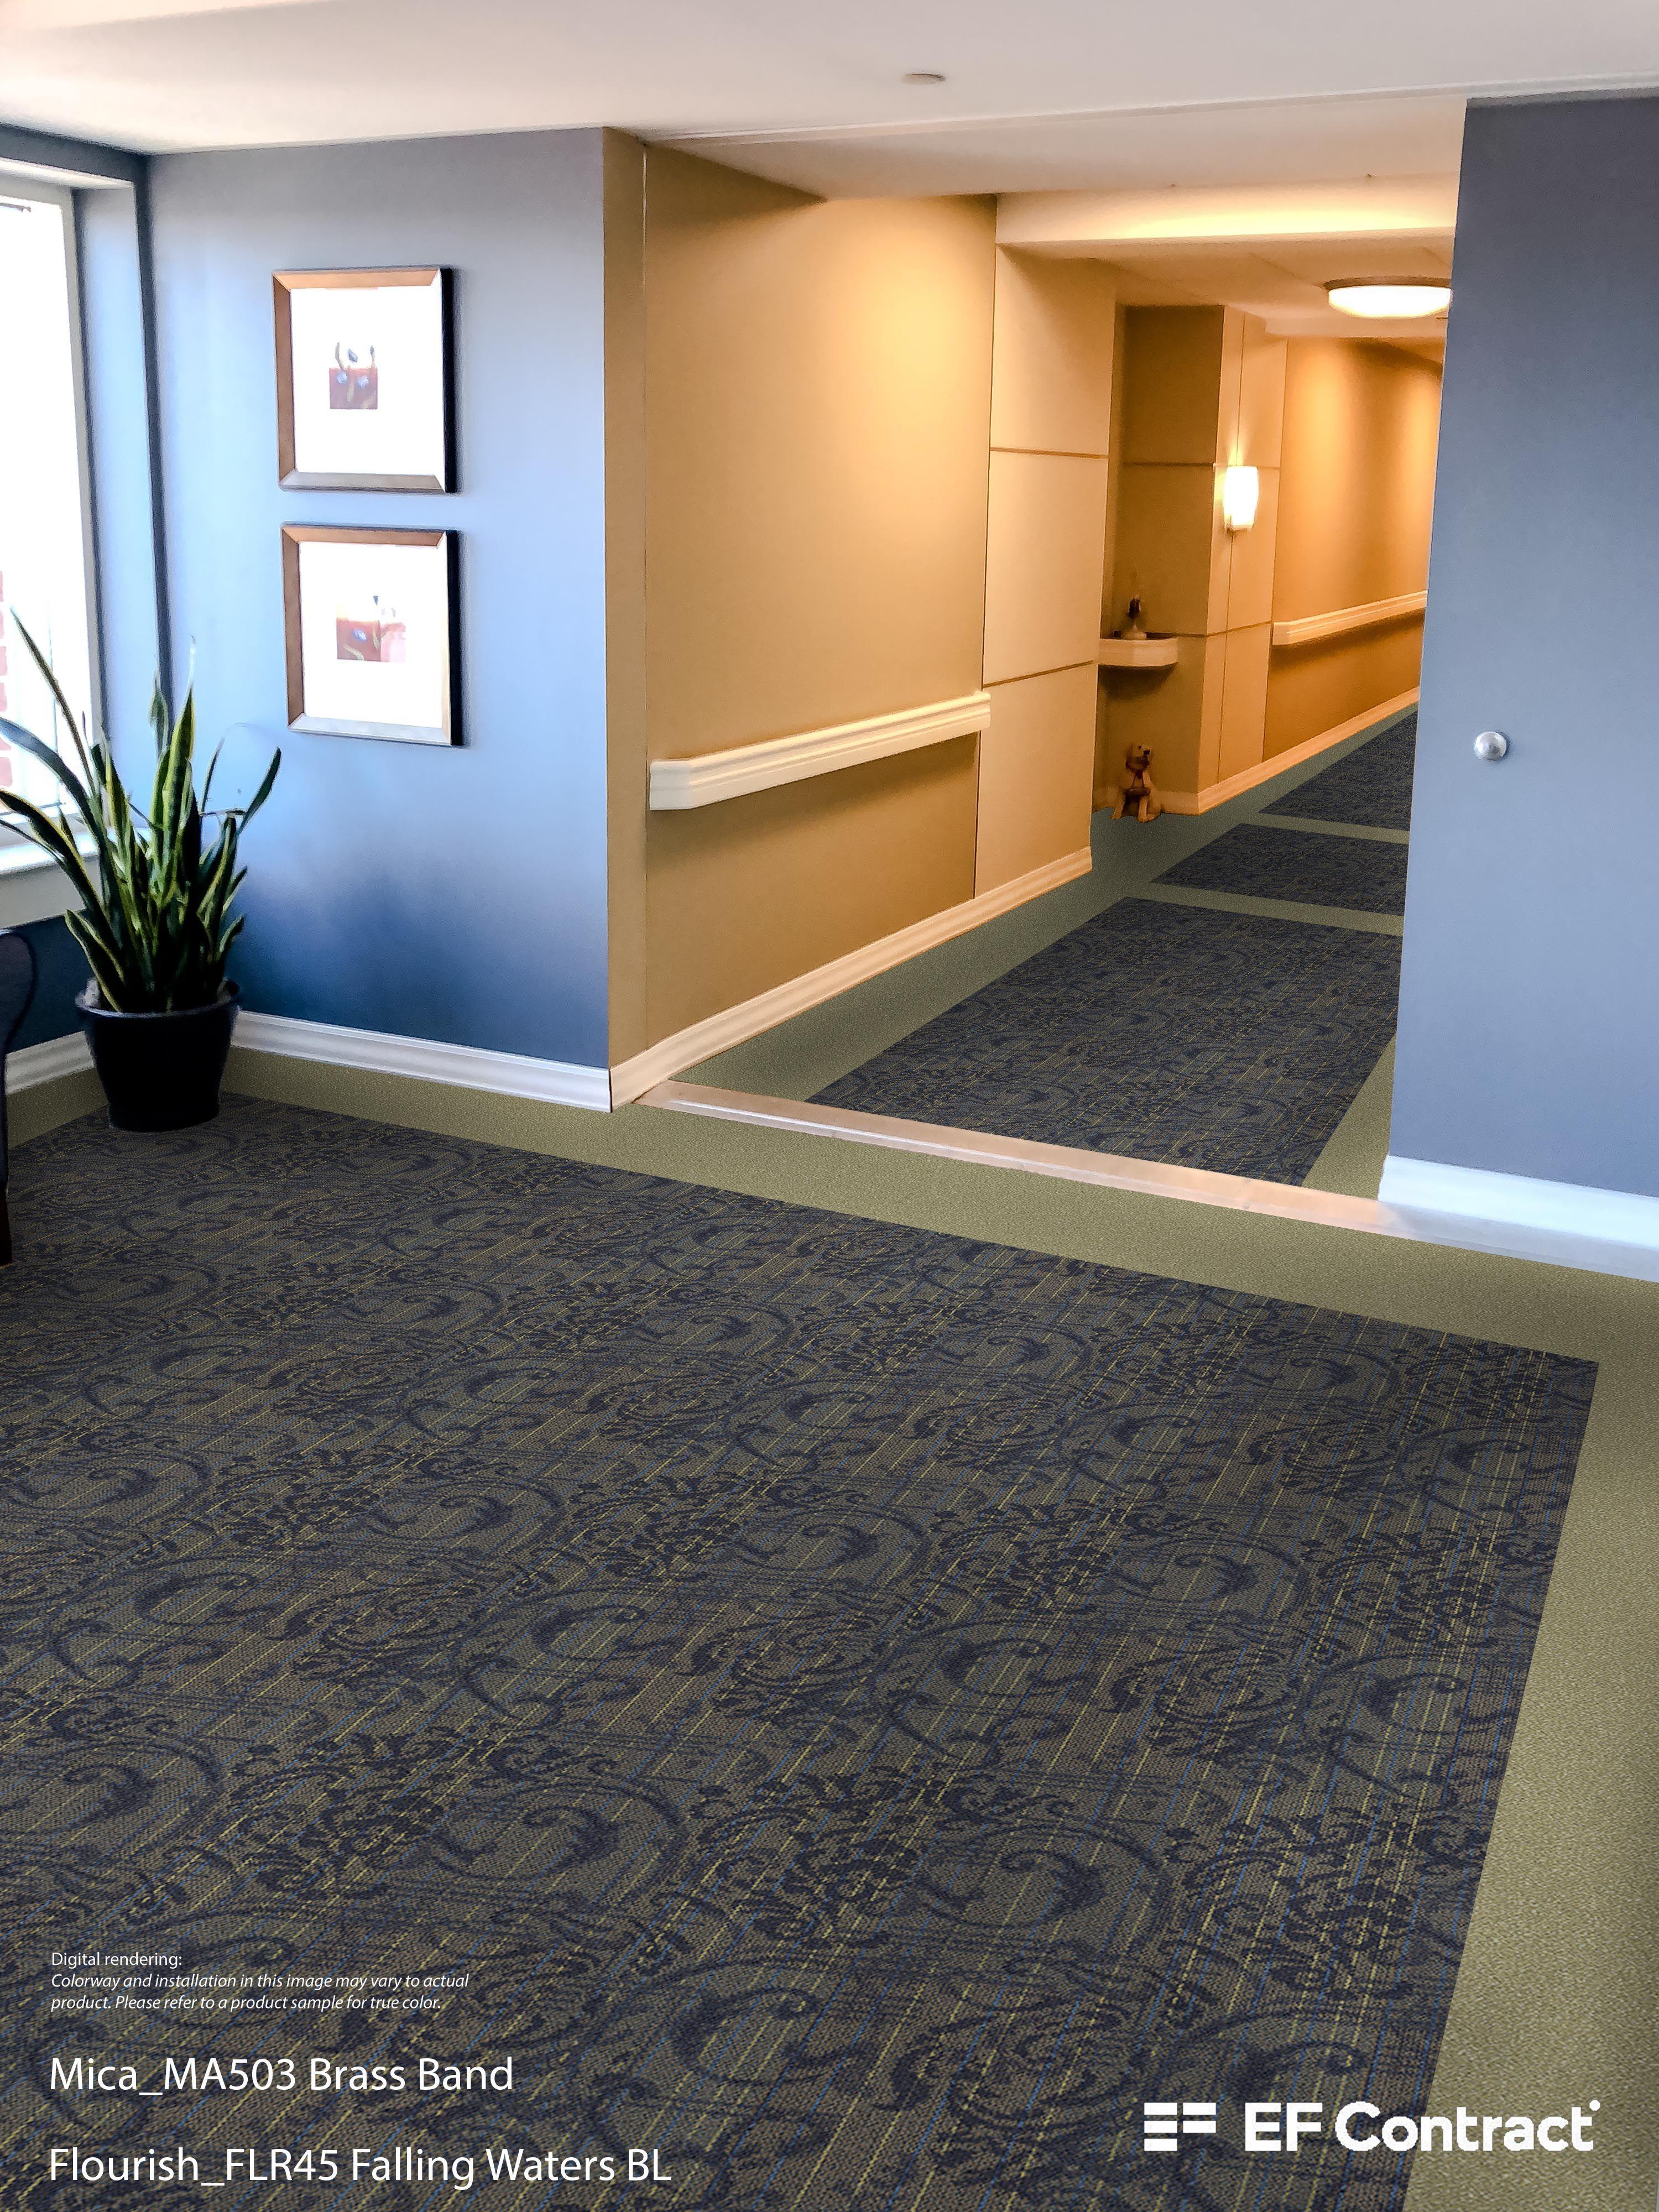 Flourish Vr Installation Flooring Flourish Outdoor Decor